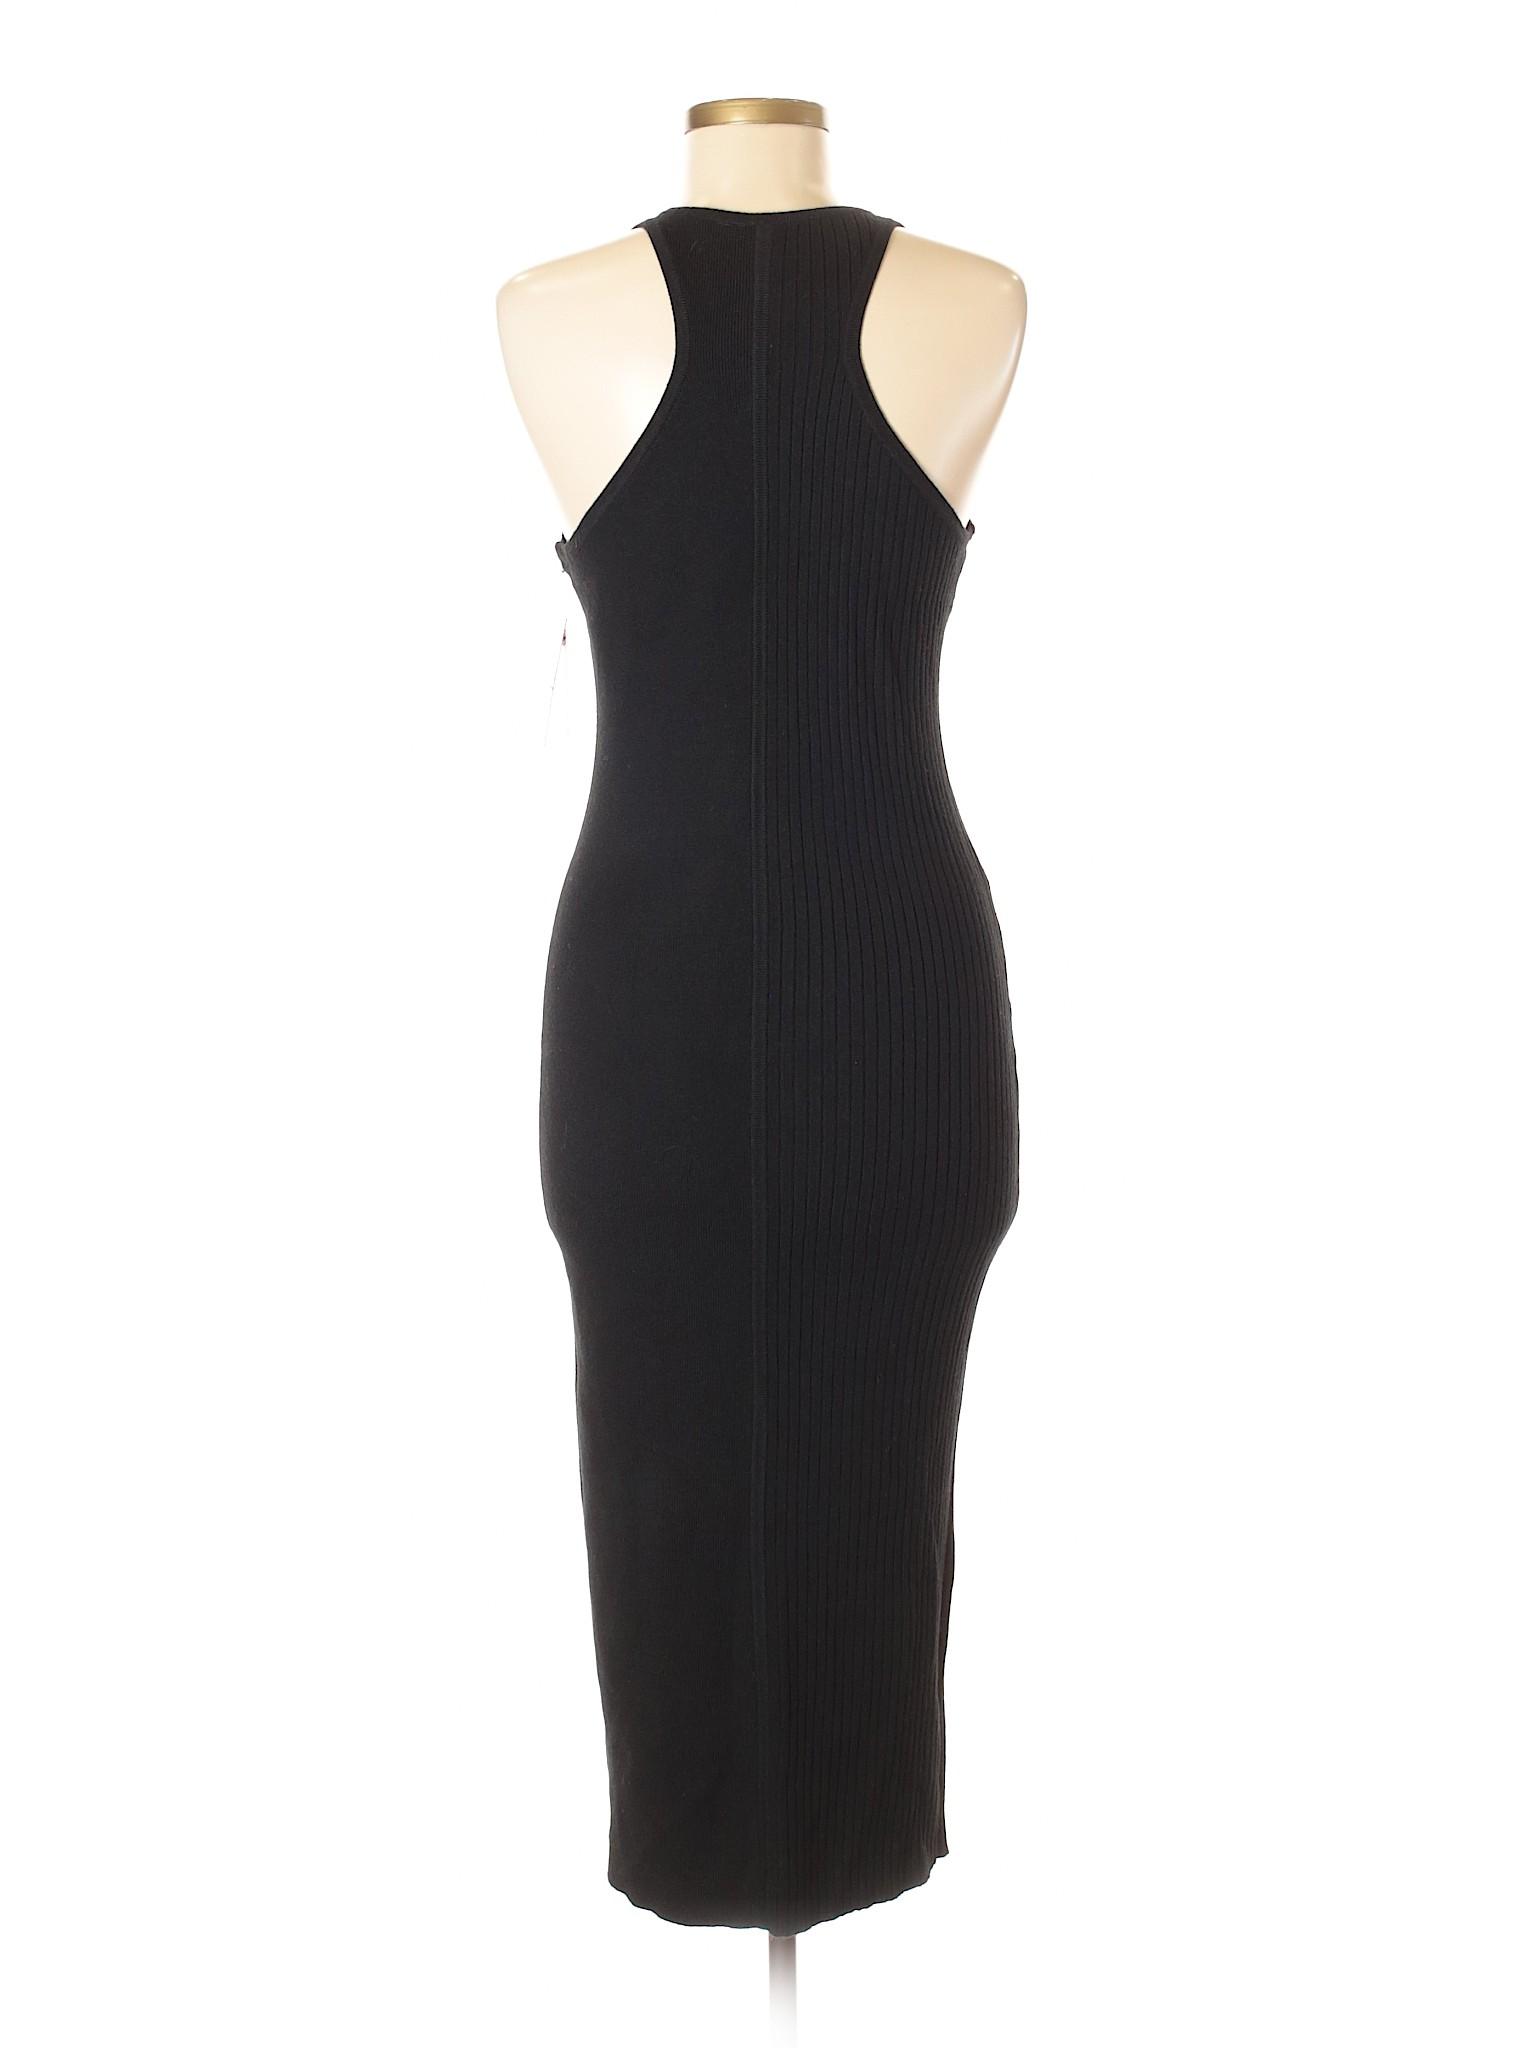 Boutique Dress winter Boutique winter Casual Guess p5q56w0Xx